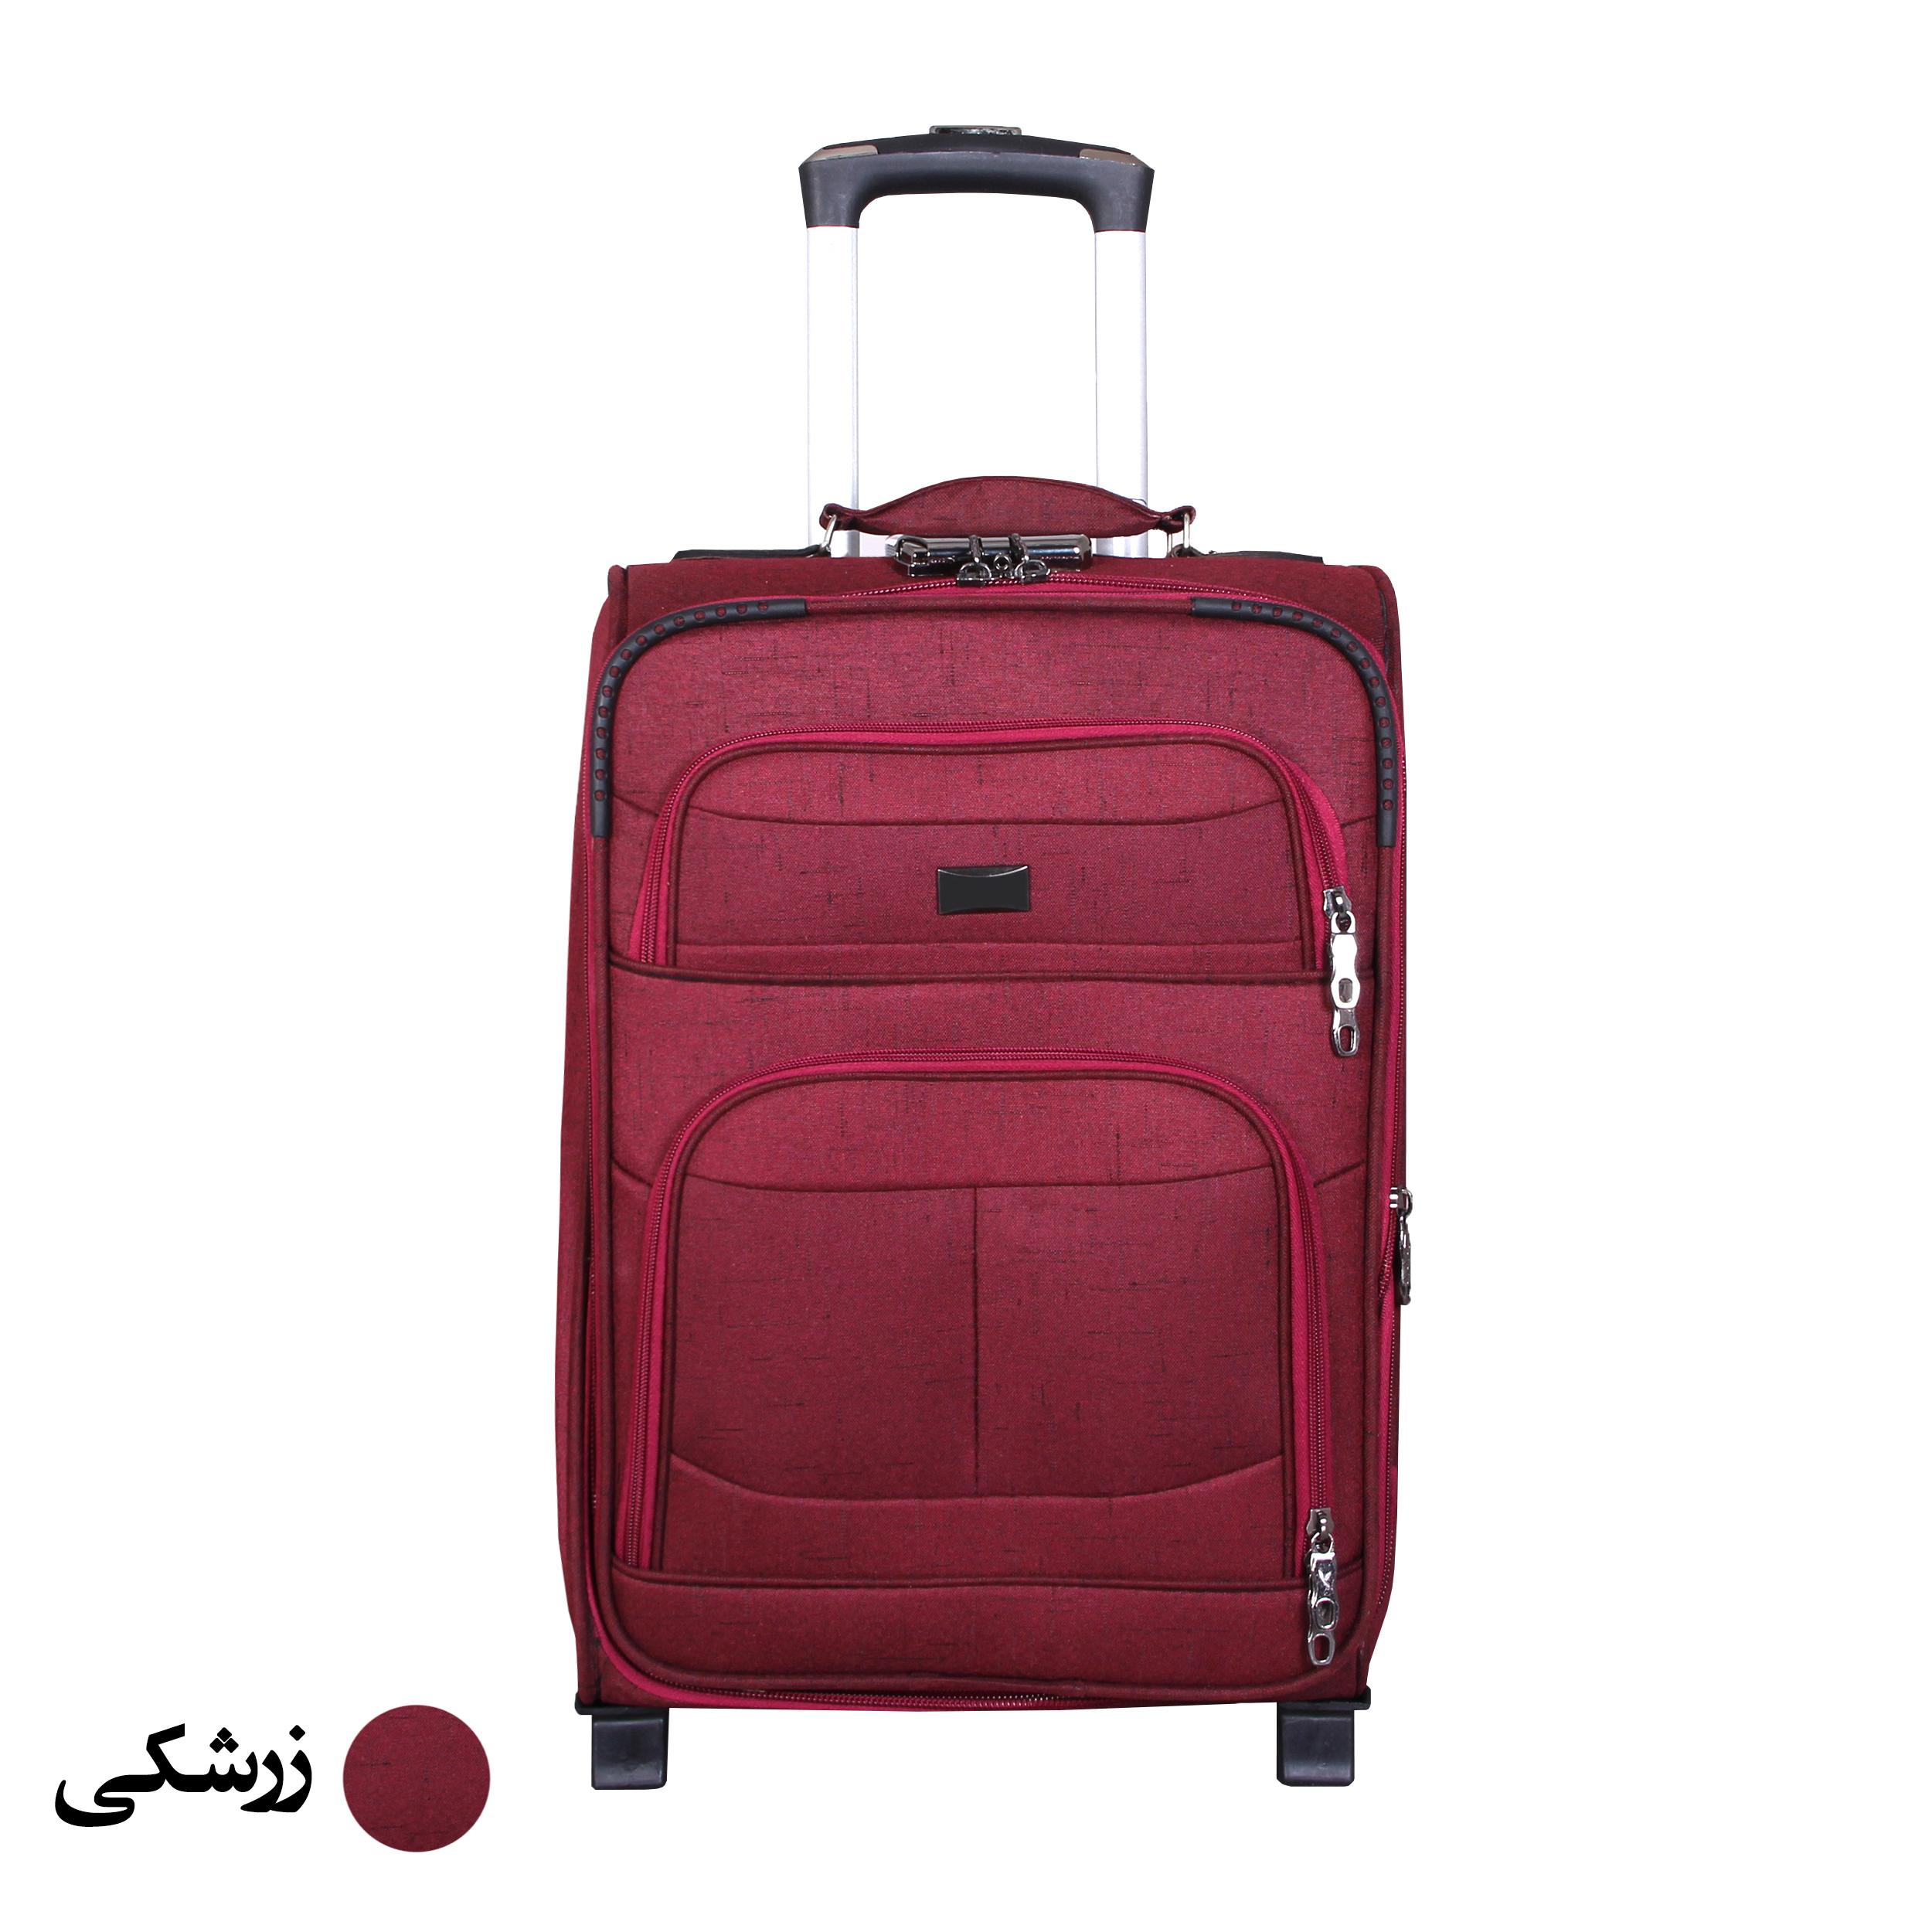 مجموعه سه عددی چمدان کد 2301A main 1 1